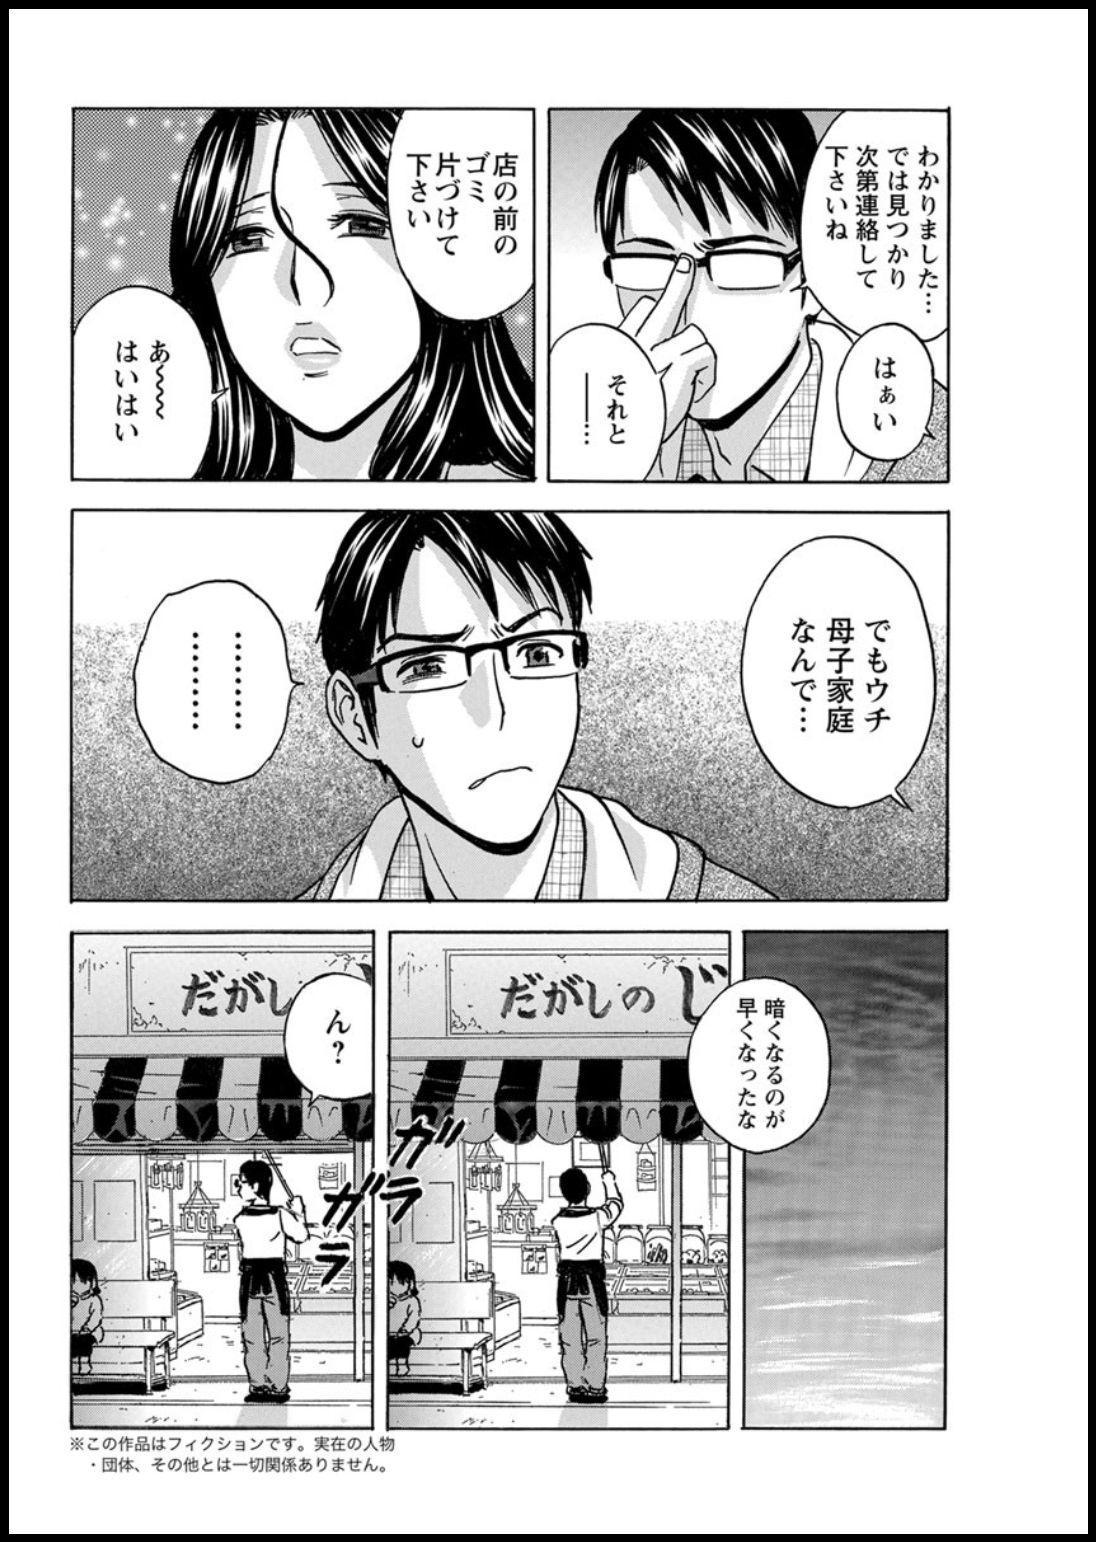 [Hidemaru] Yurase Bikyonyuu! Hataraku J-Cup Ch. 1-5 [Digital] 41